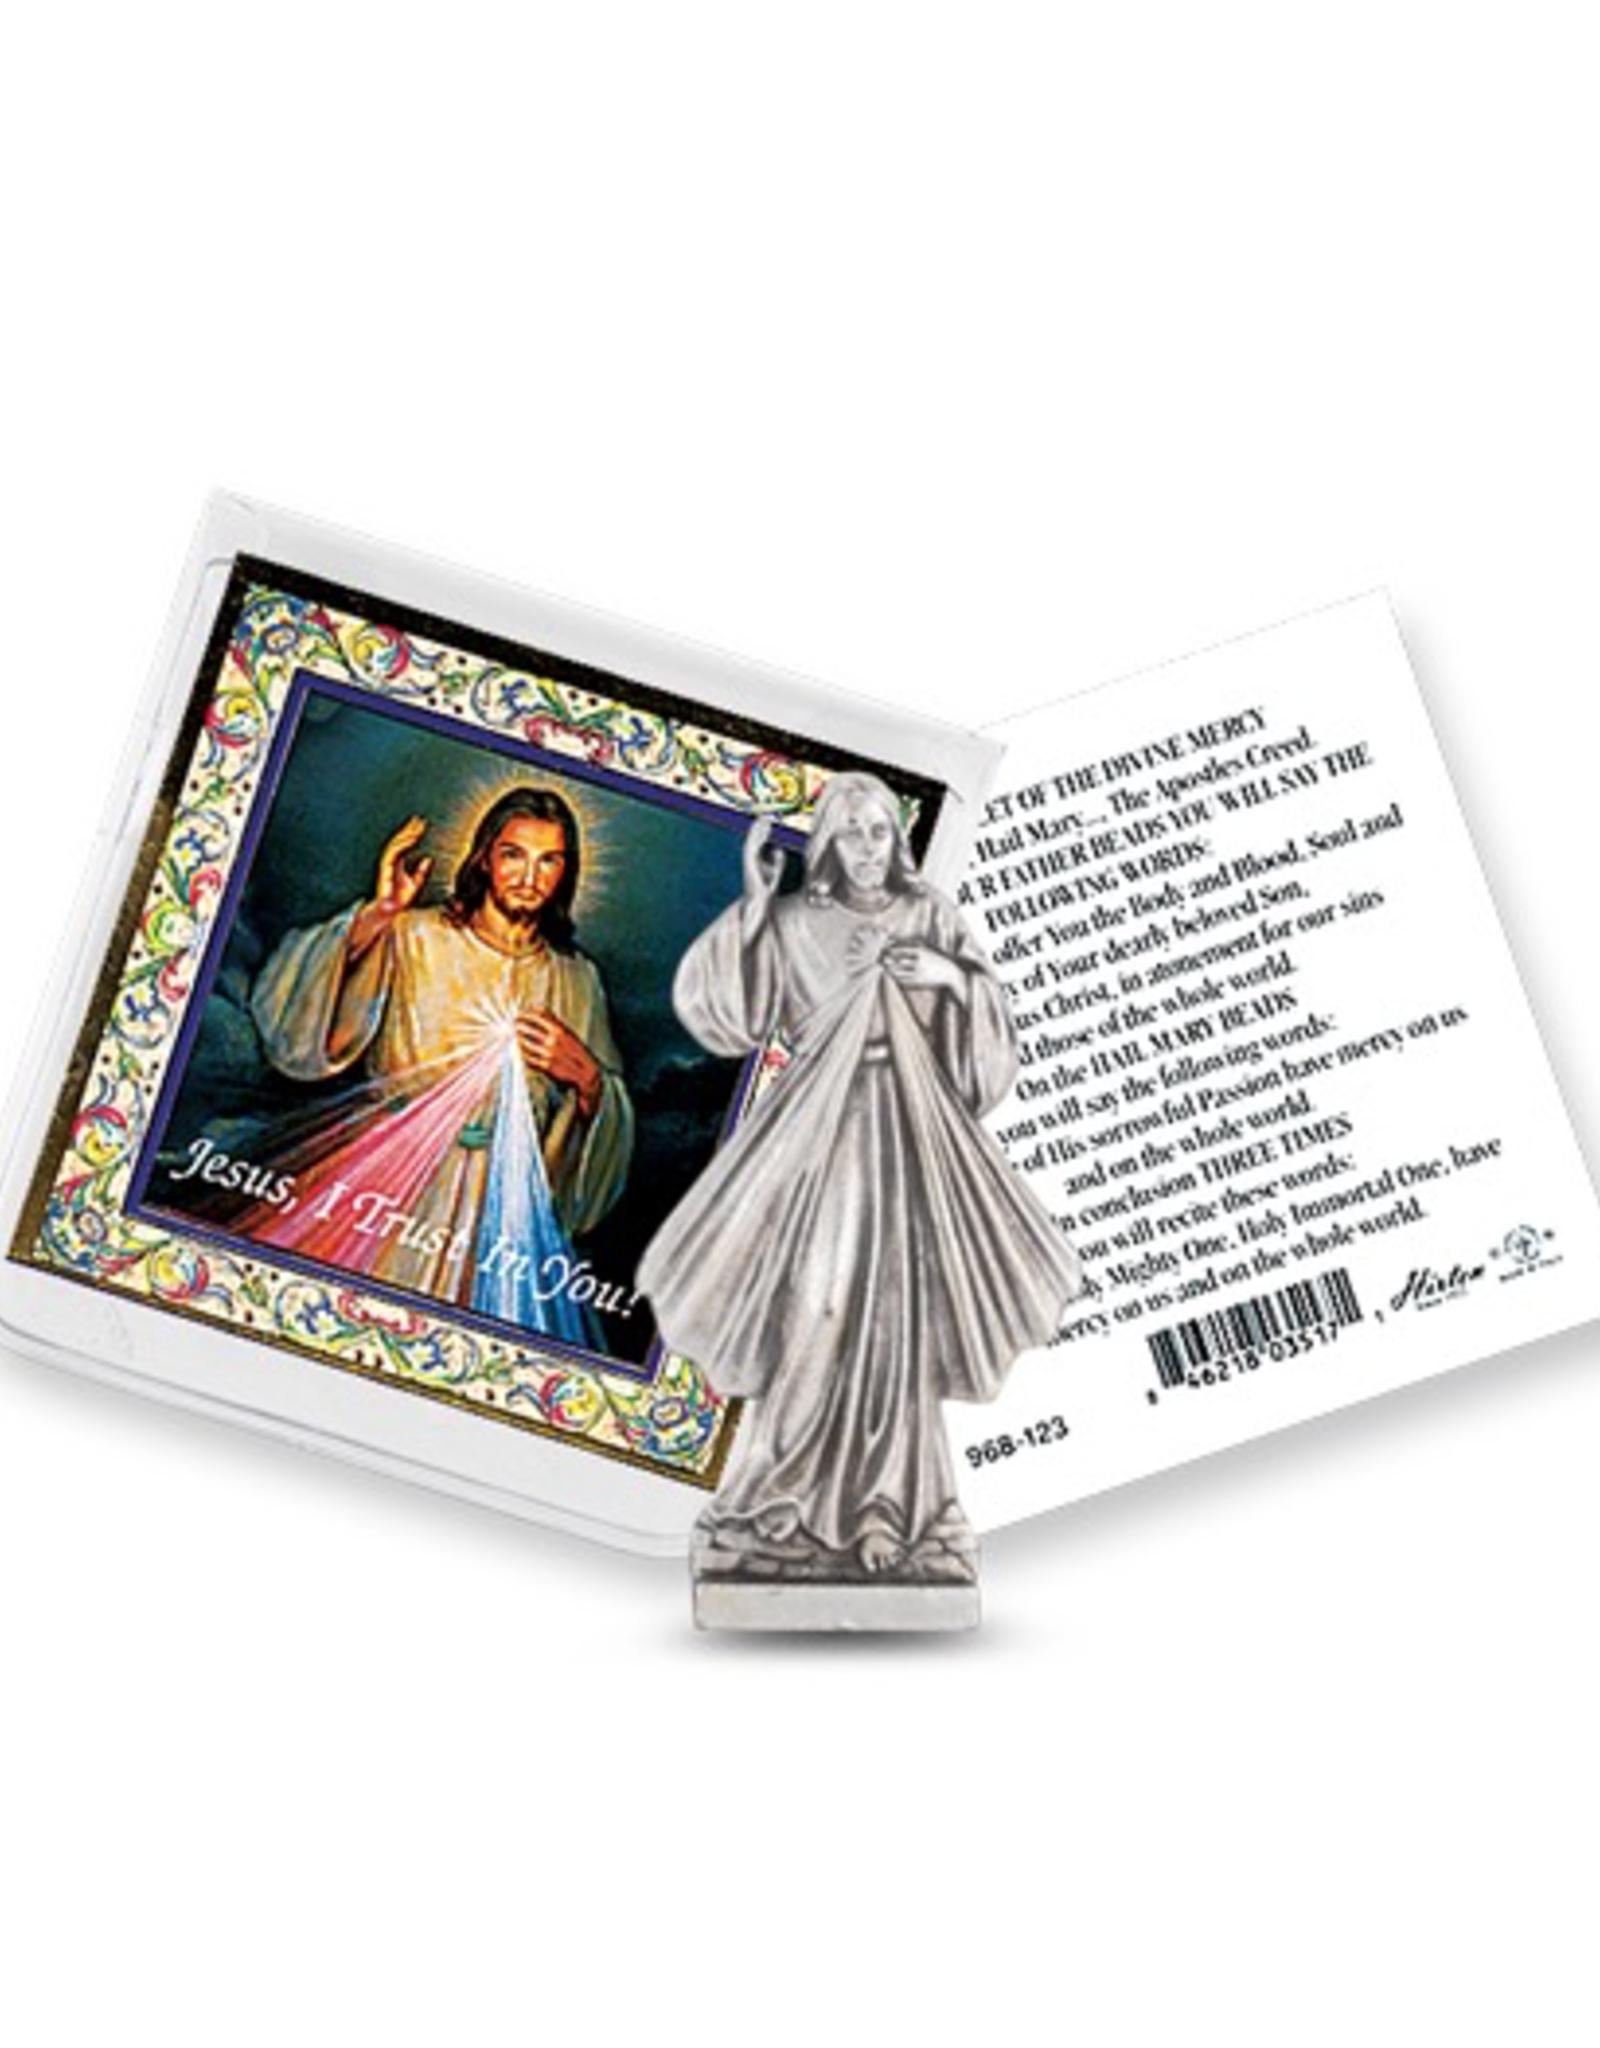 WJ Hirten Divine Mercy Pockert Statue w/ Prayer